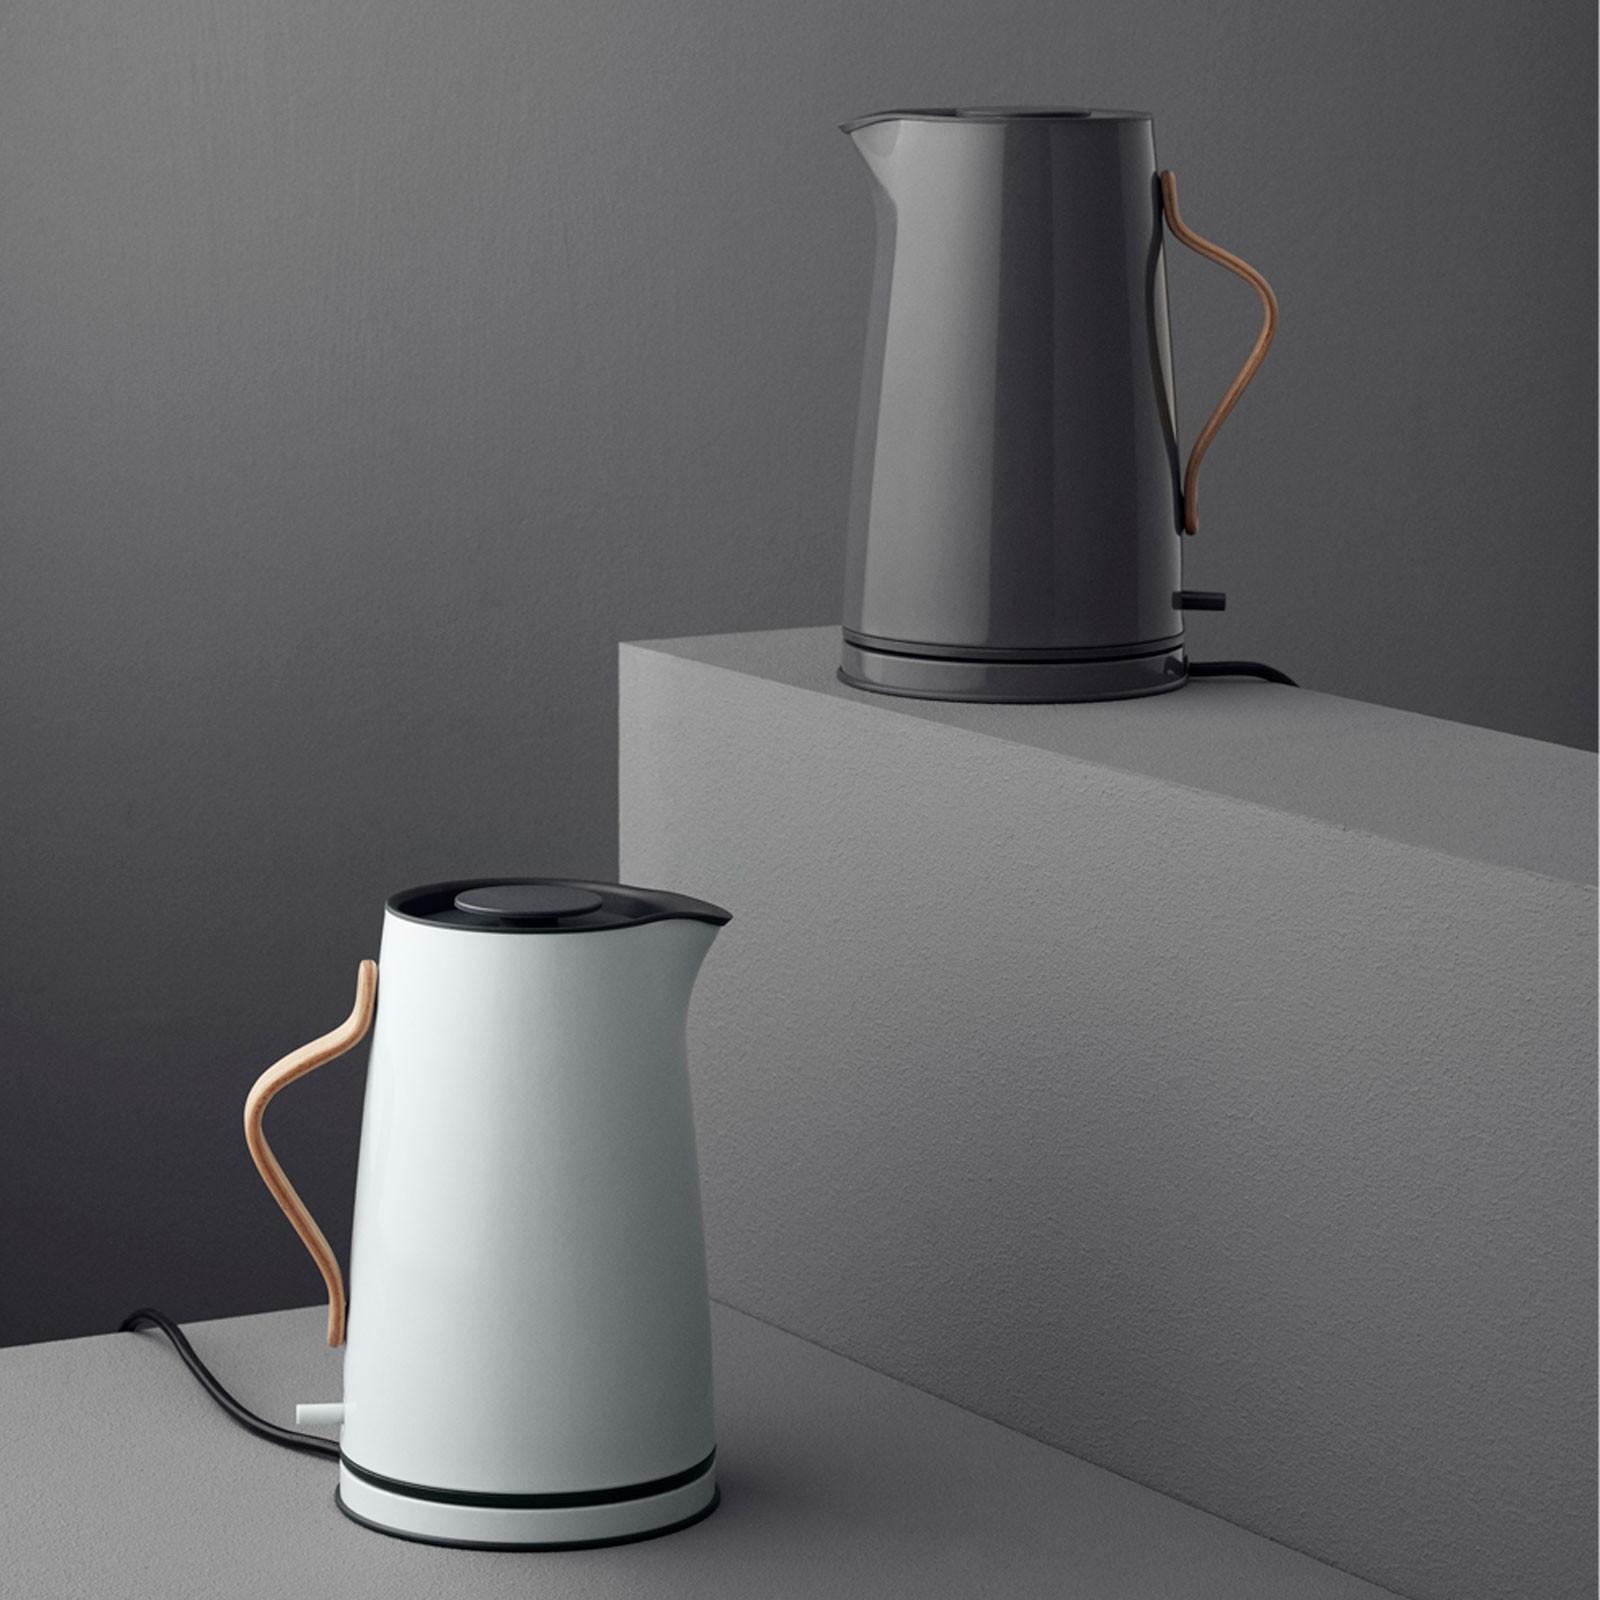 Wasserkocher Modern wasserkocher schwarz 1 2 l edelstahl buchenholzgriff